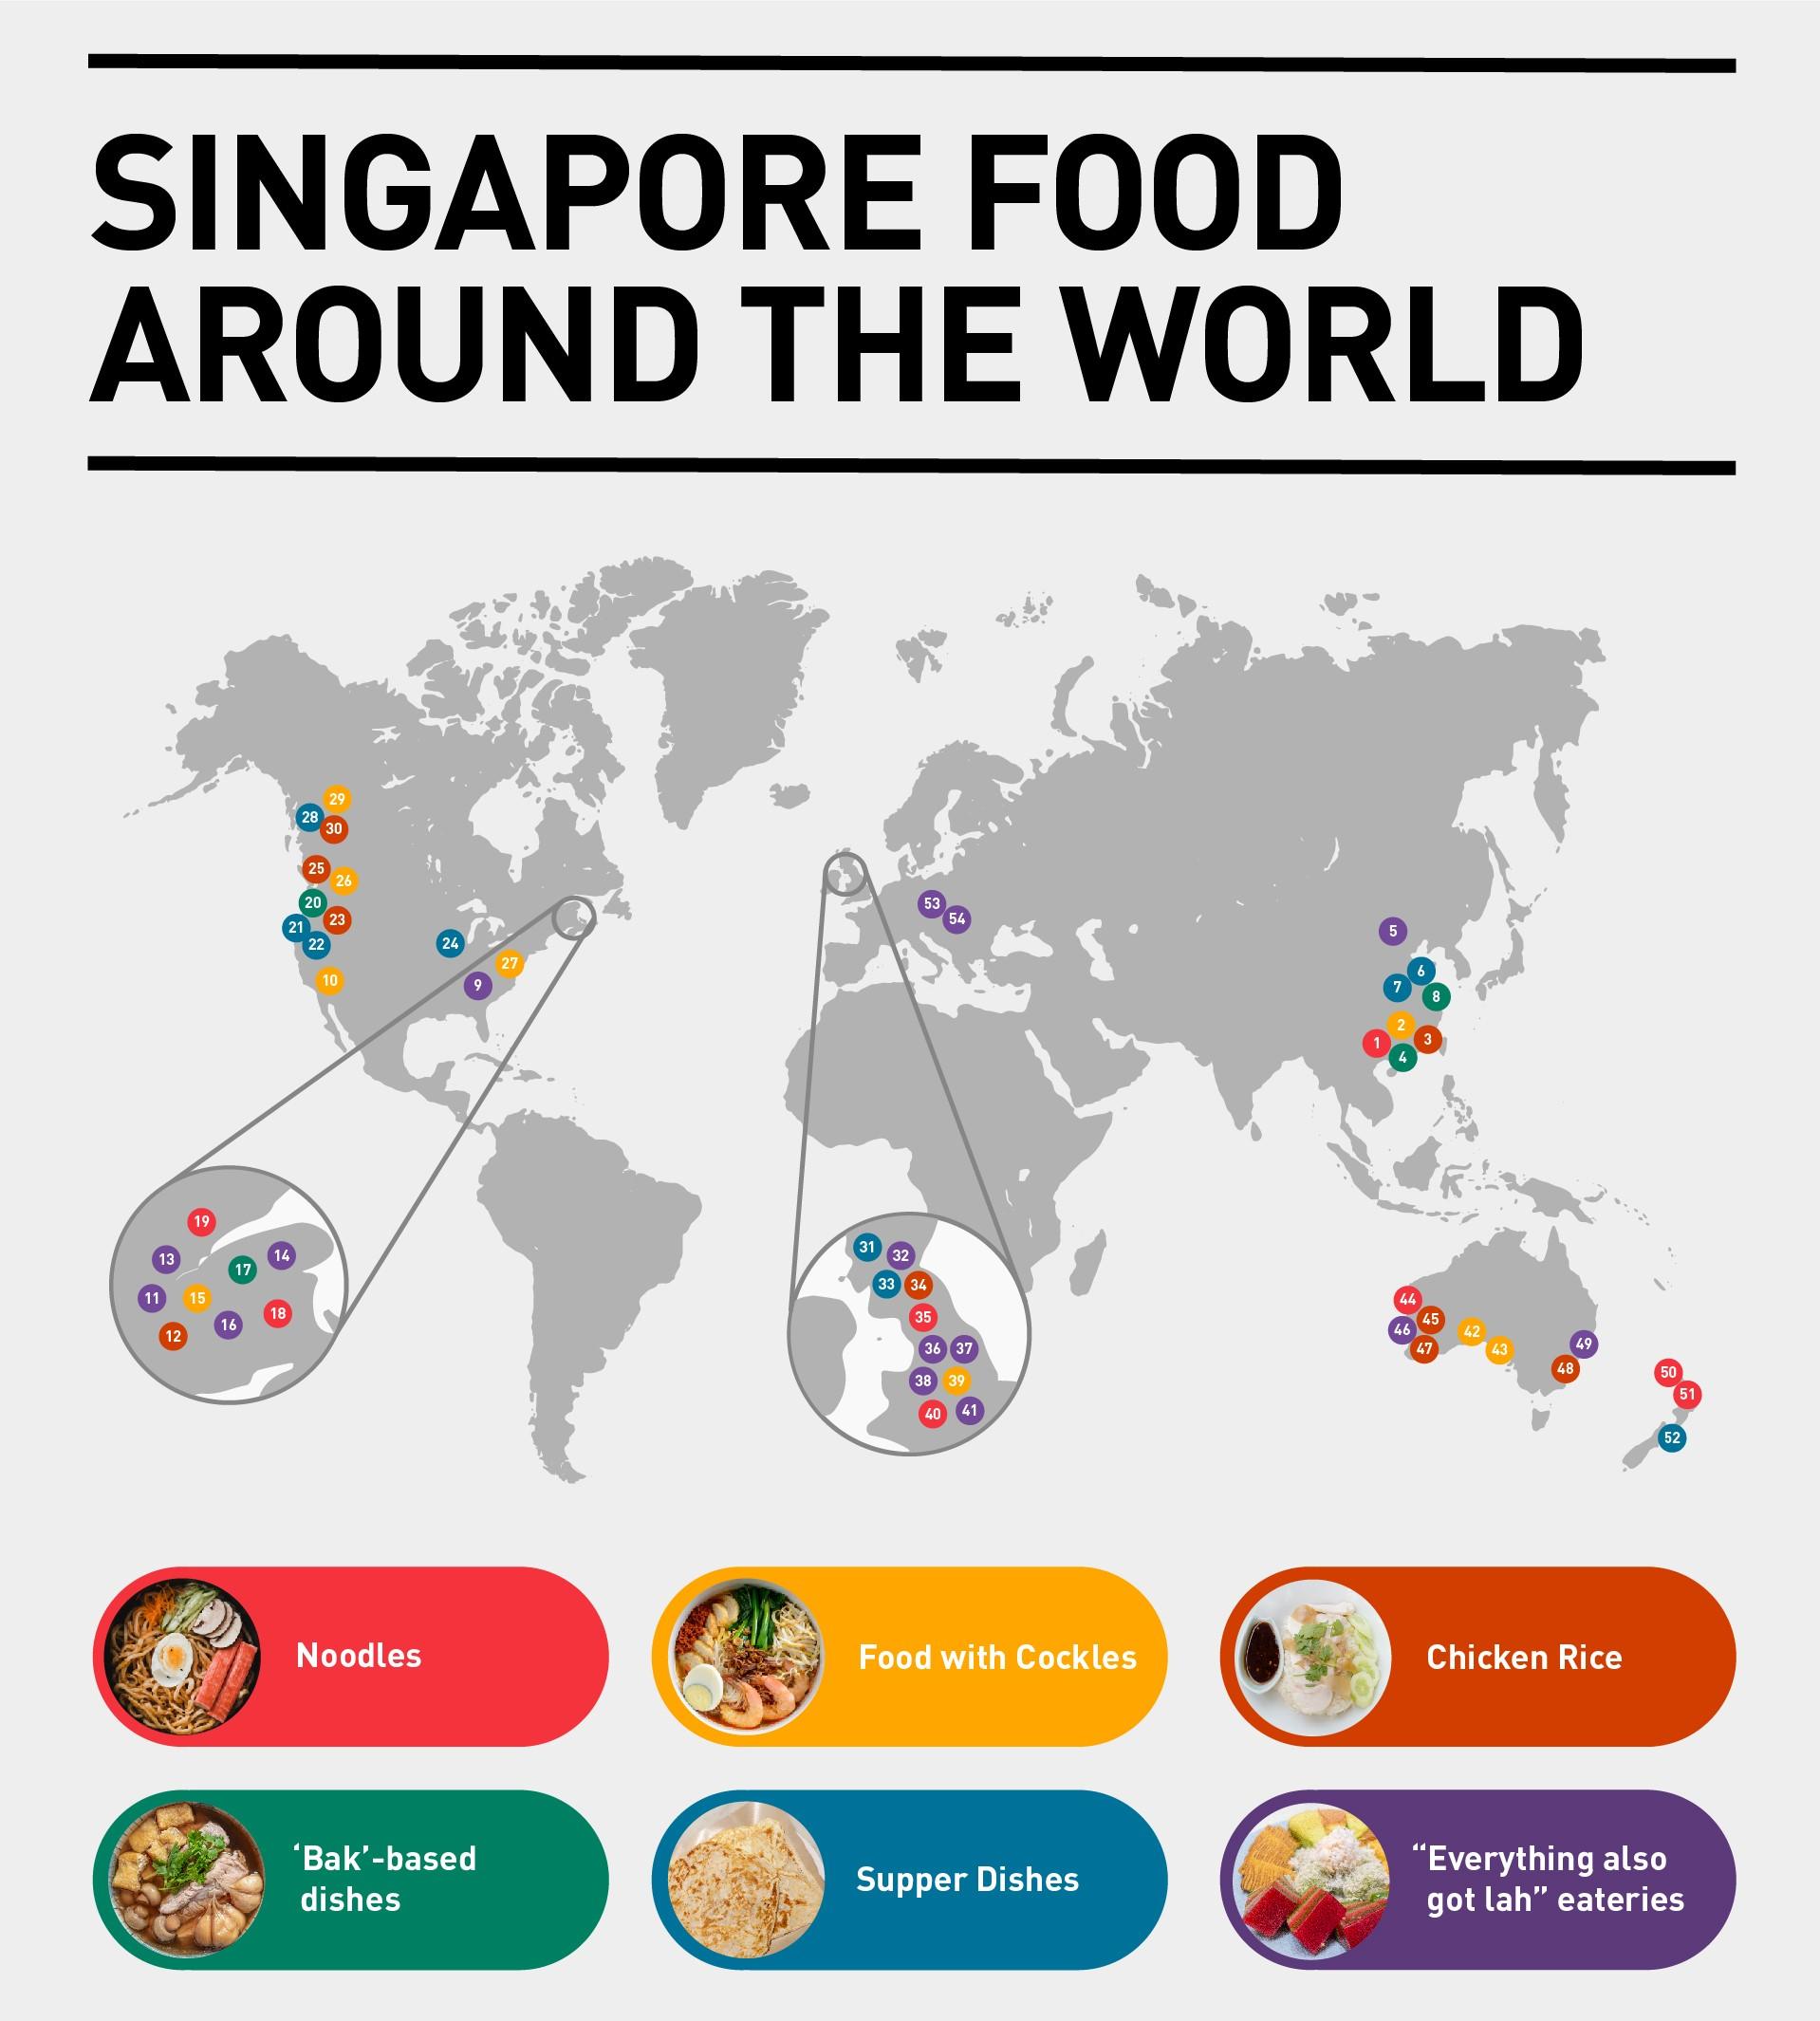 Singapore Food around the world